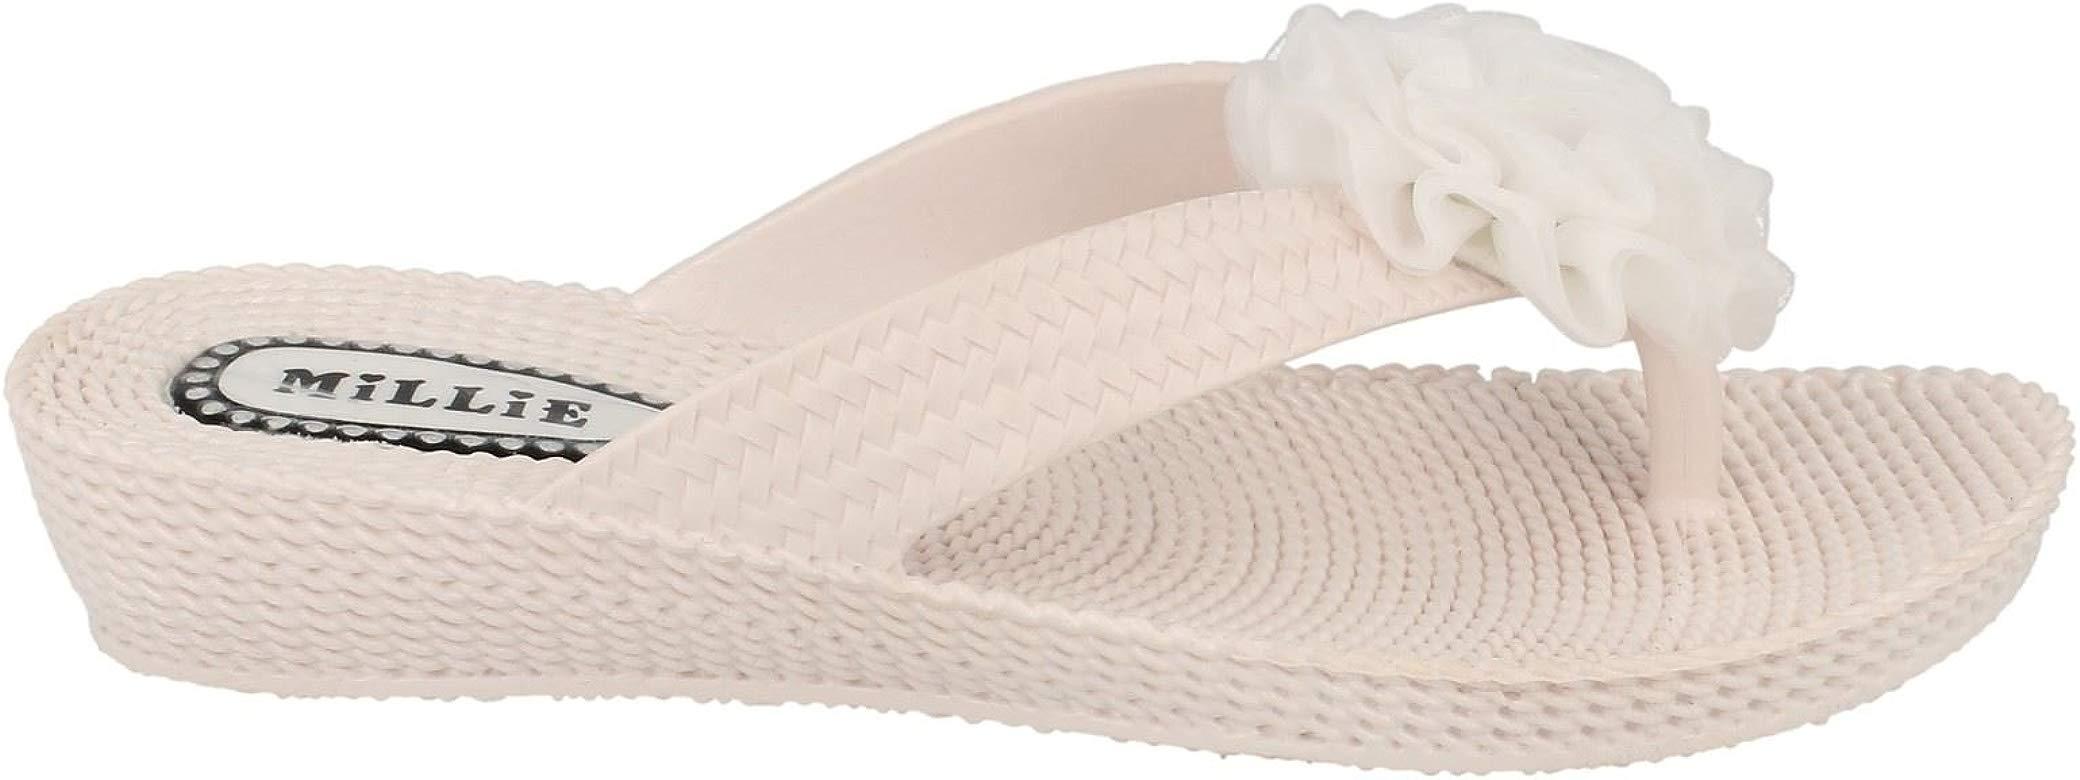 Ladies L402 beige synthetic flip flop sandal by Millie Retail Price £5.99